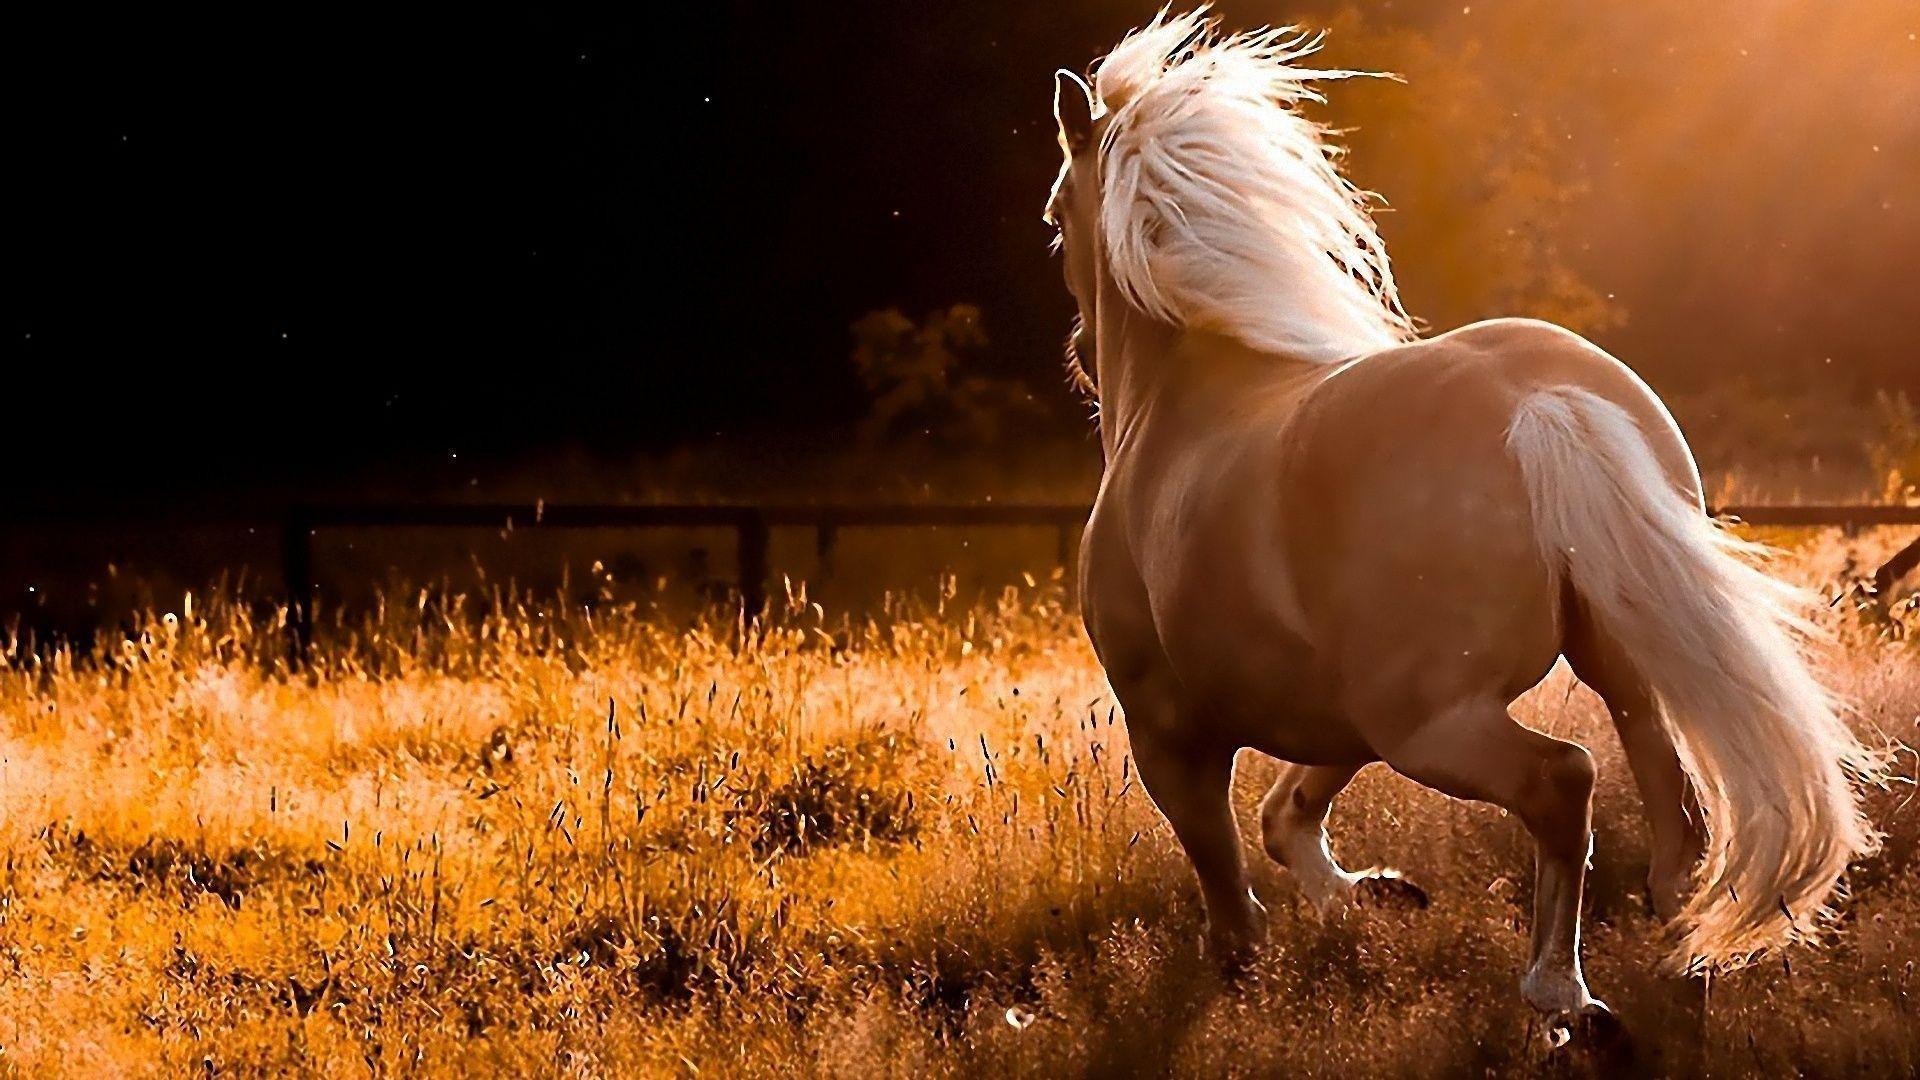 white running horse desktop background desktop backgrounds hq